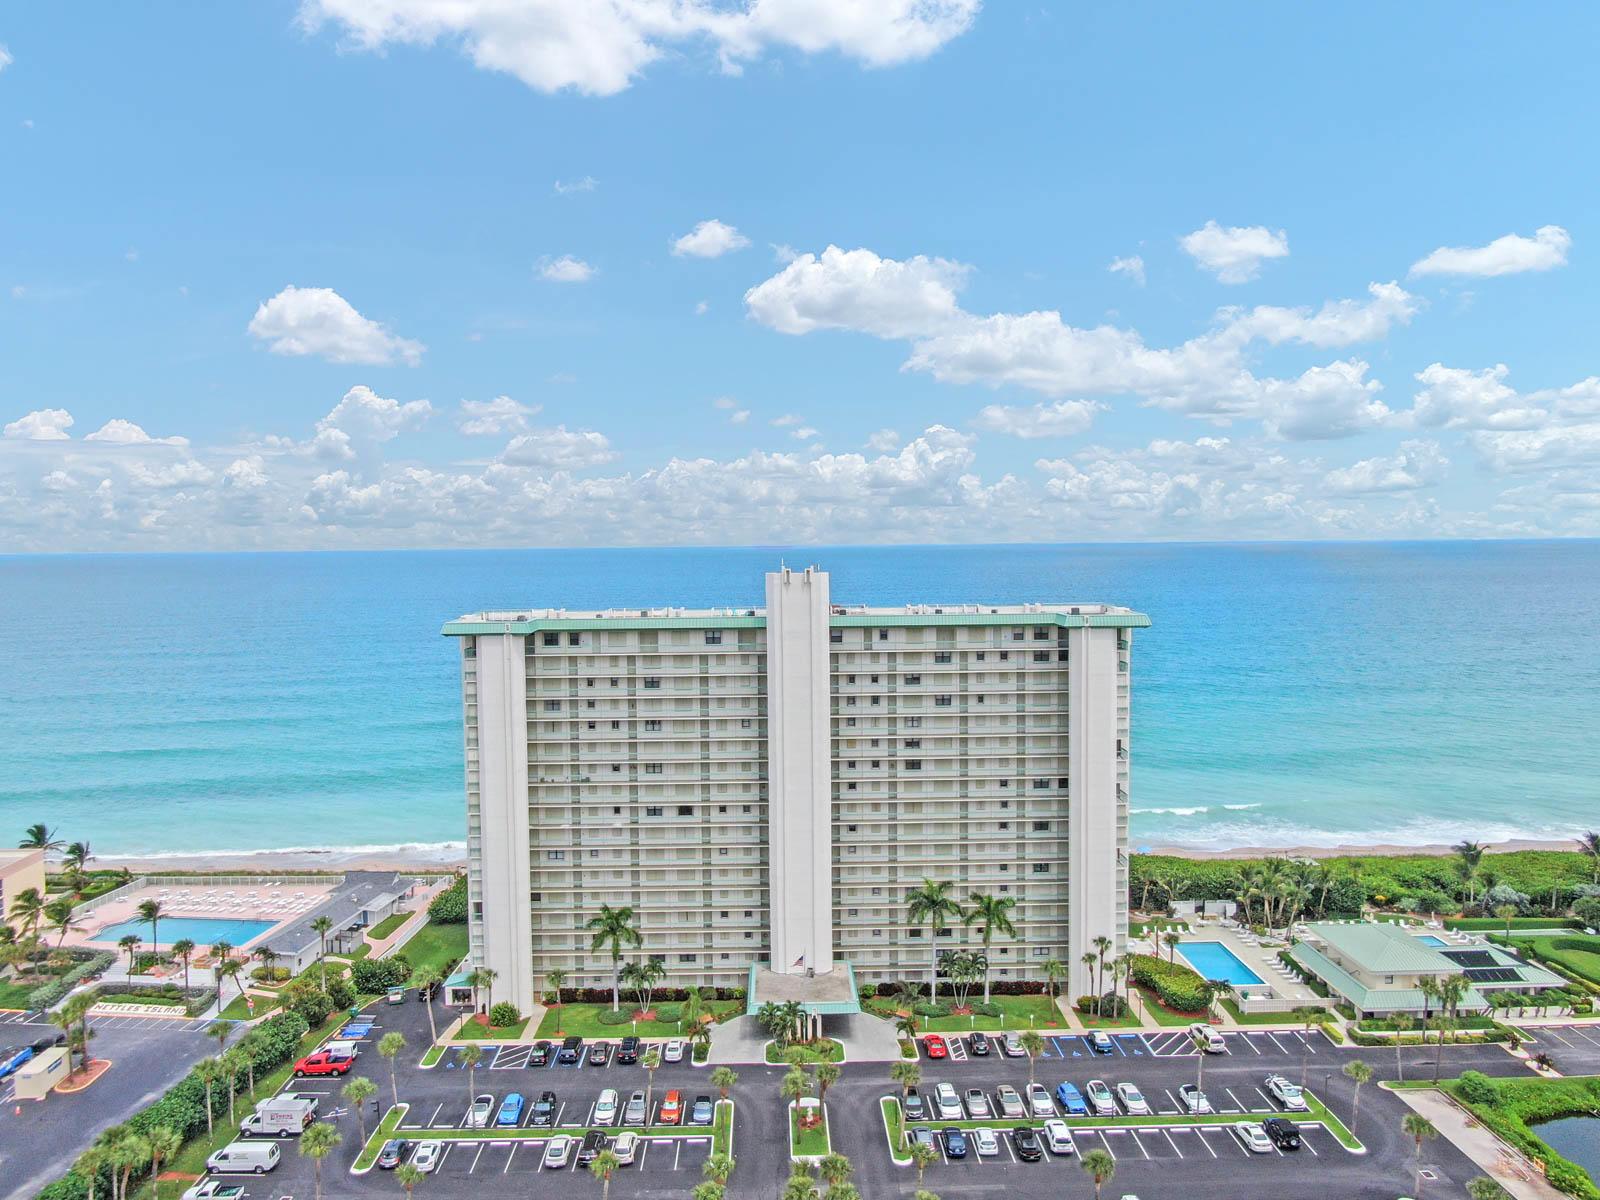 9900 Ocean S Jensen Beach 34957